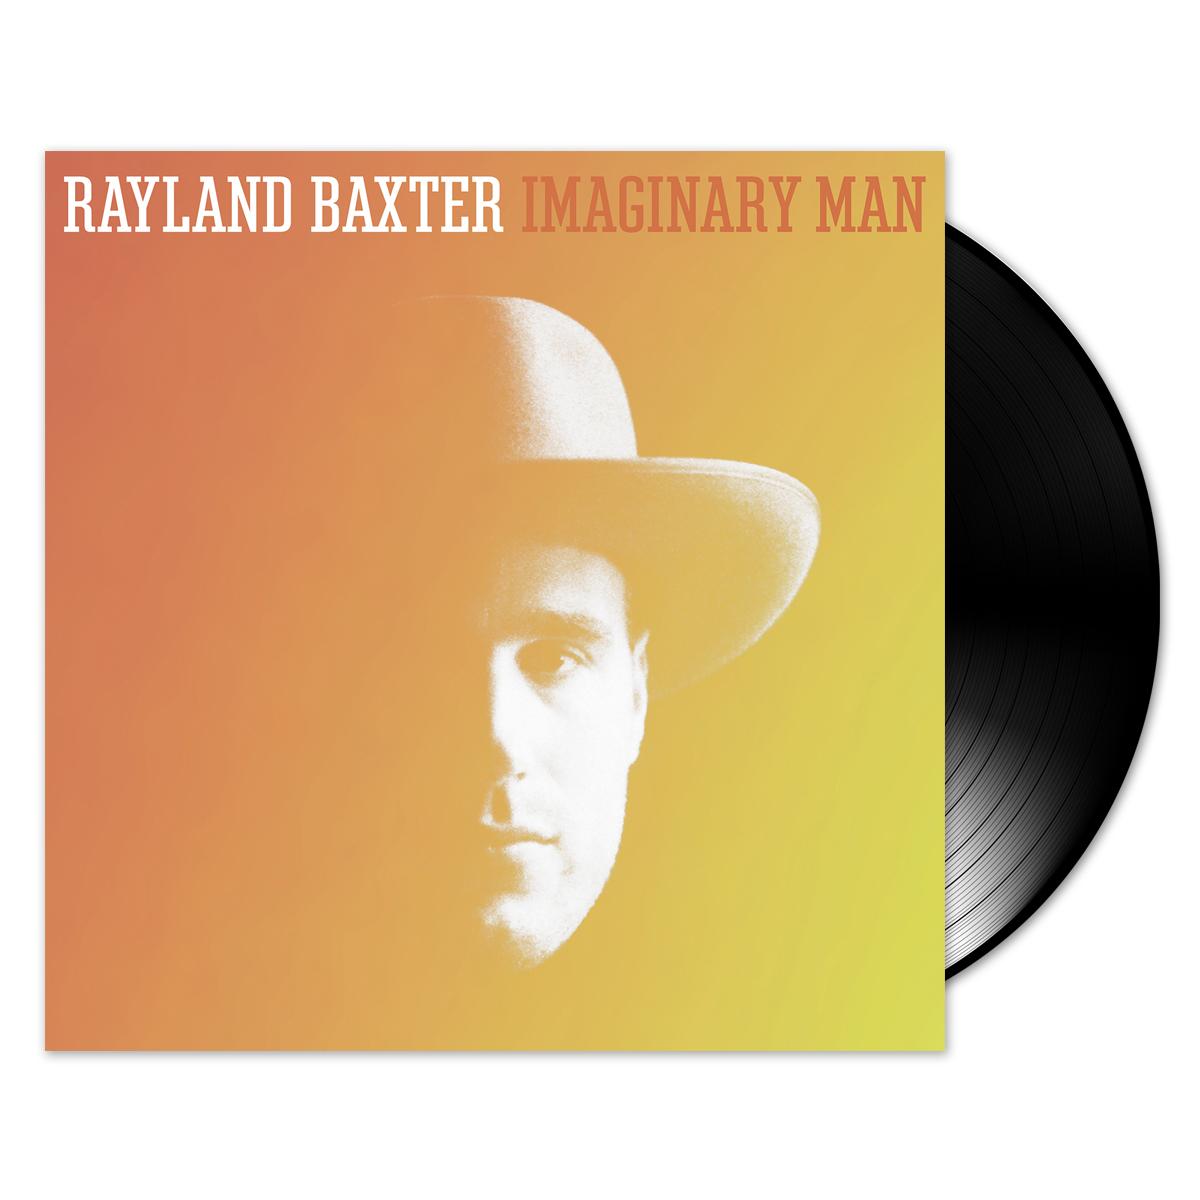 Rayland Baxter - Imaginary Man LP